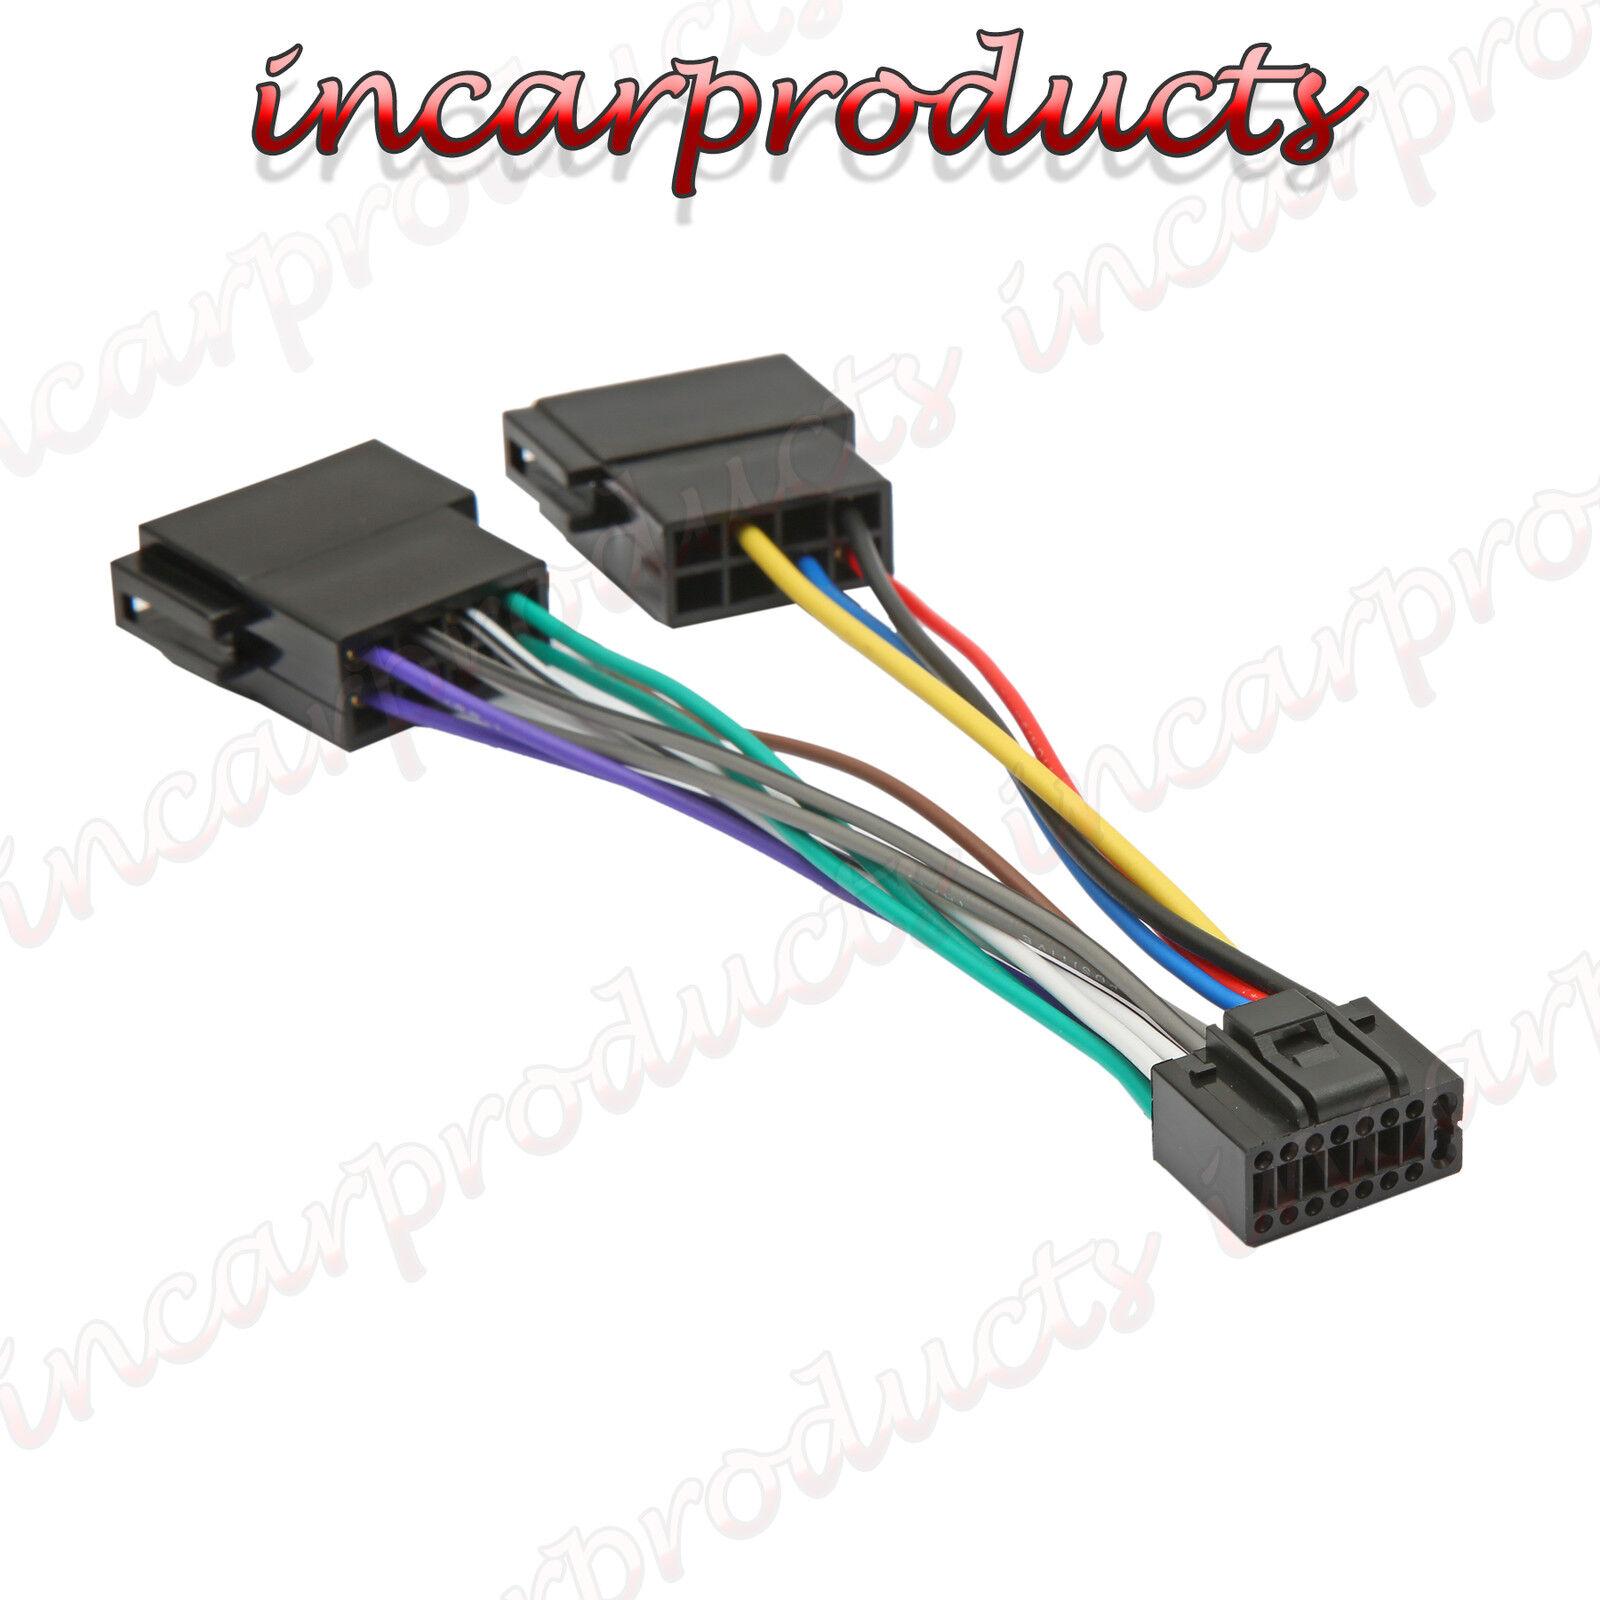 kenwood jvc 16 pin iso wiring harness connector adaptor car stereo rh ebay com jvc car stereo wiring harness adapter JVC Wiring Harness Adapter Kia